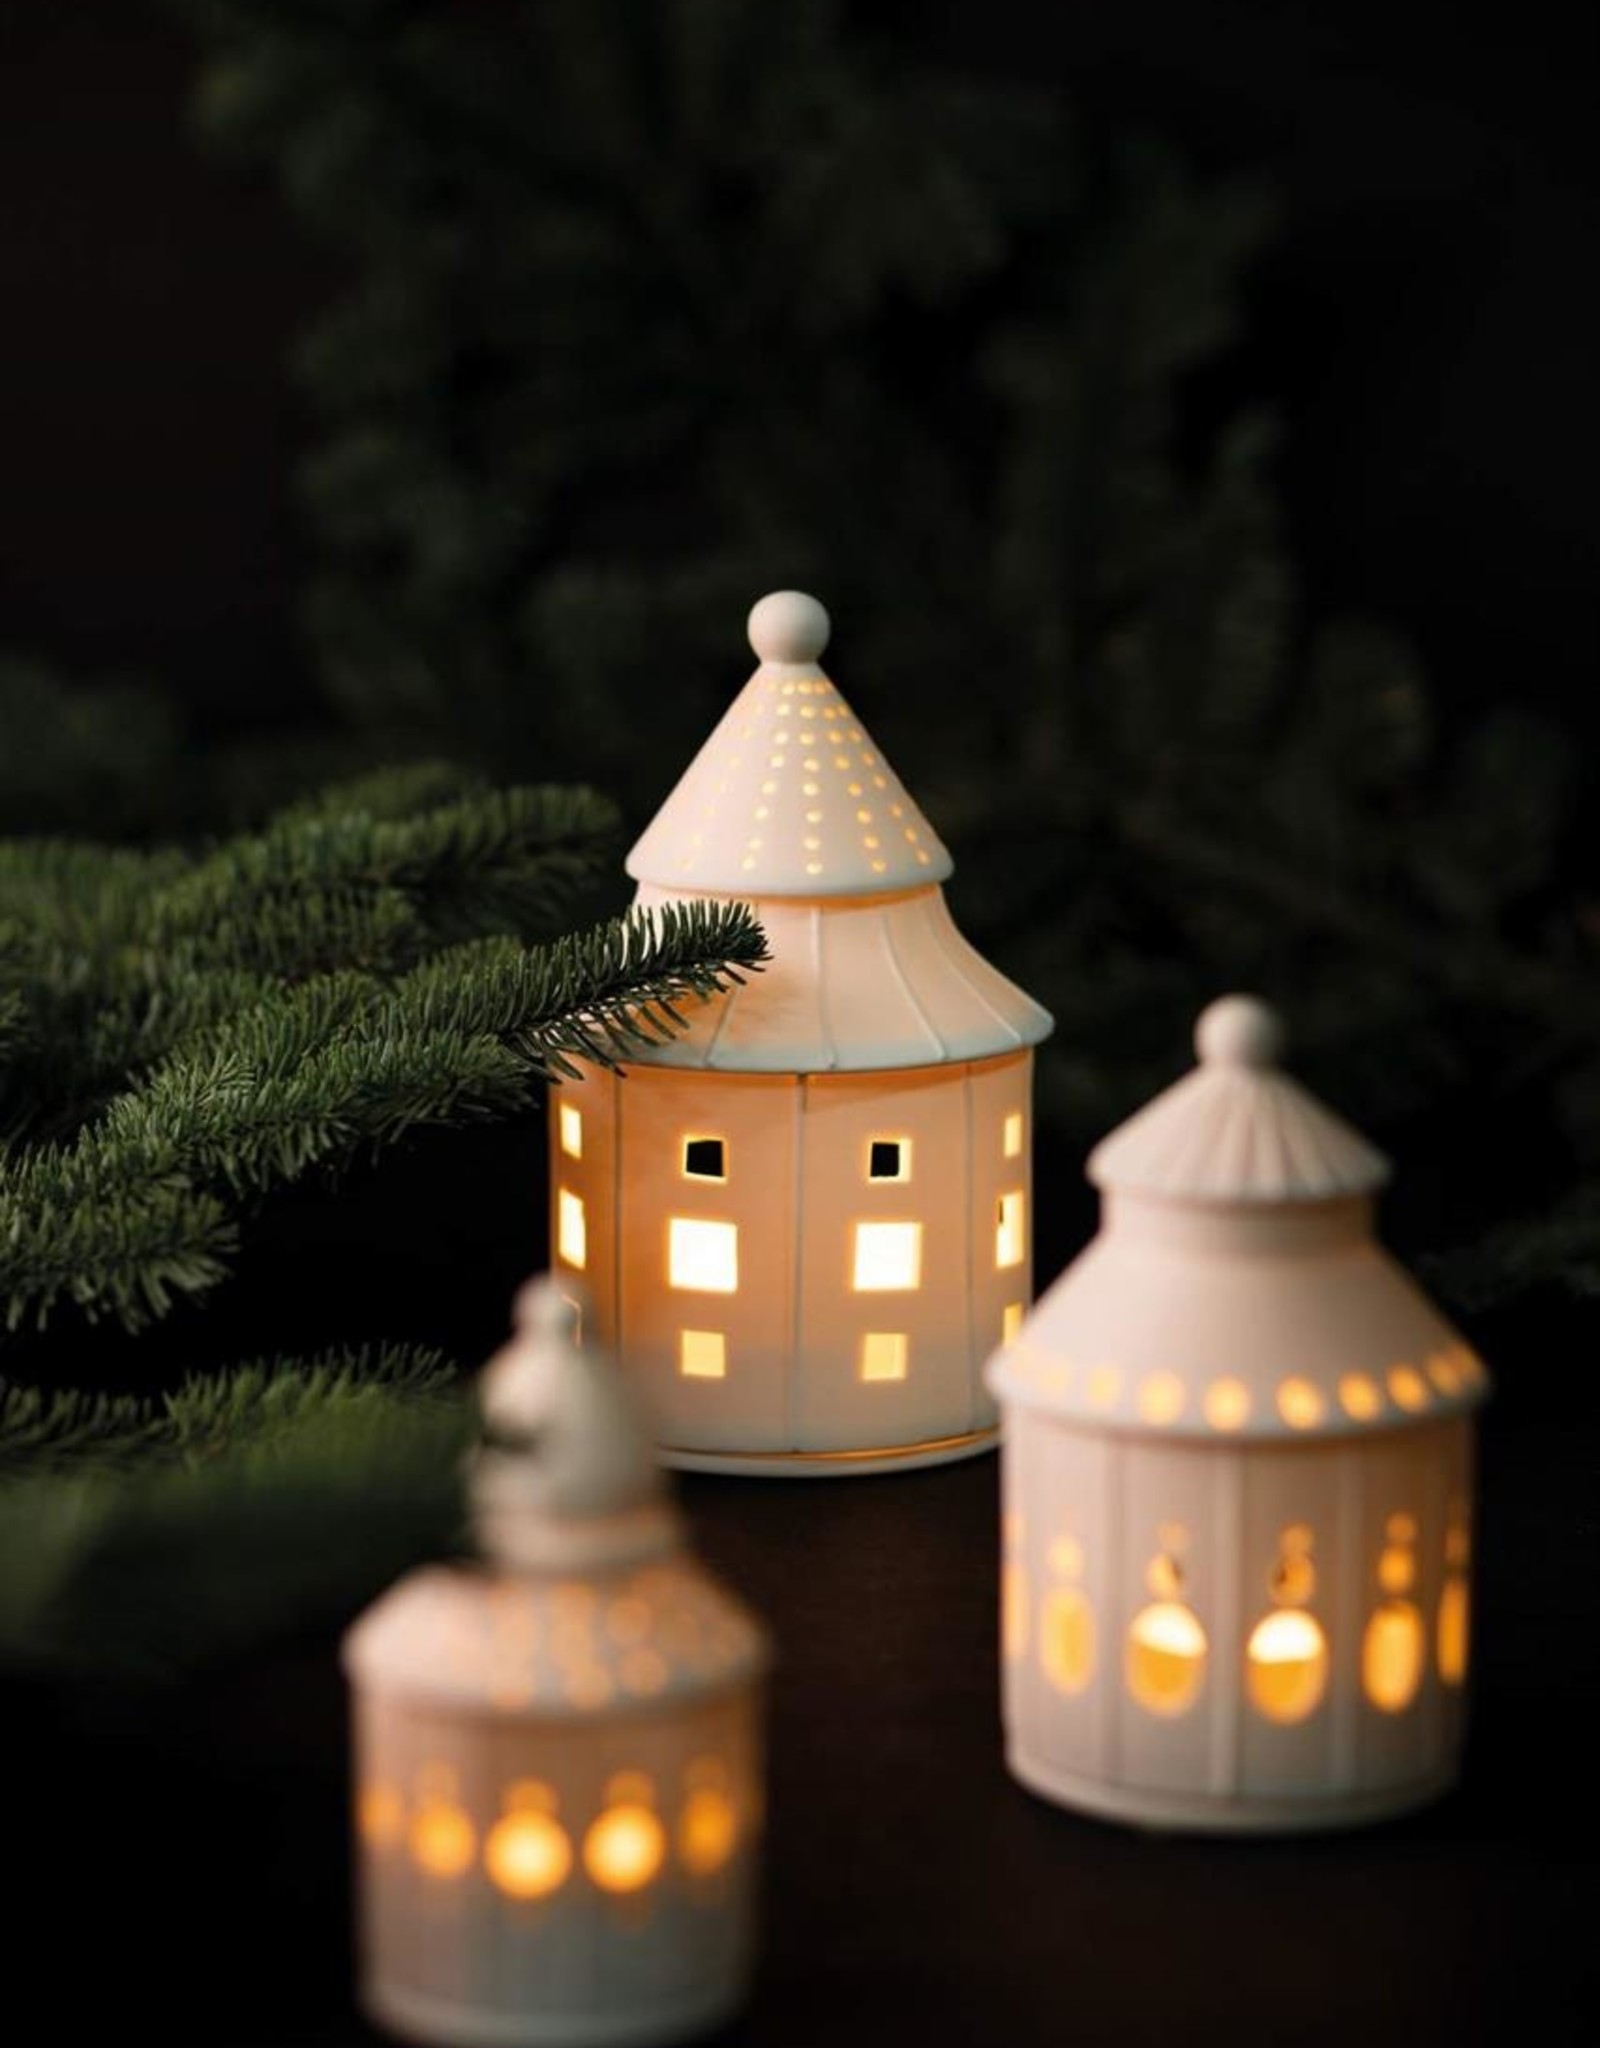 Räder Rader - Light house confectionery